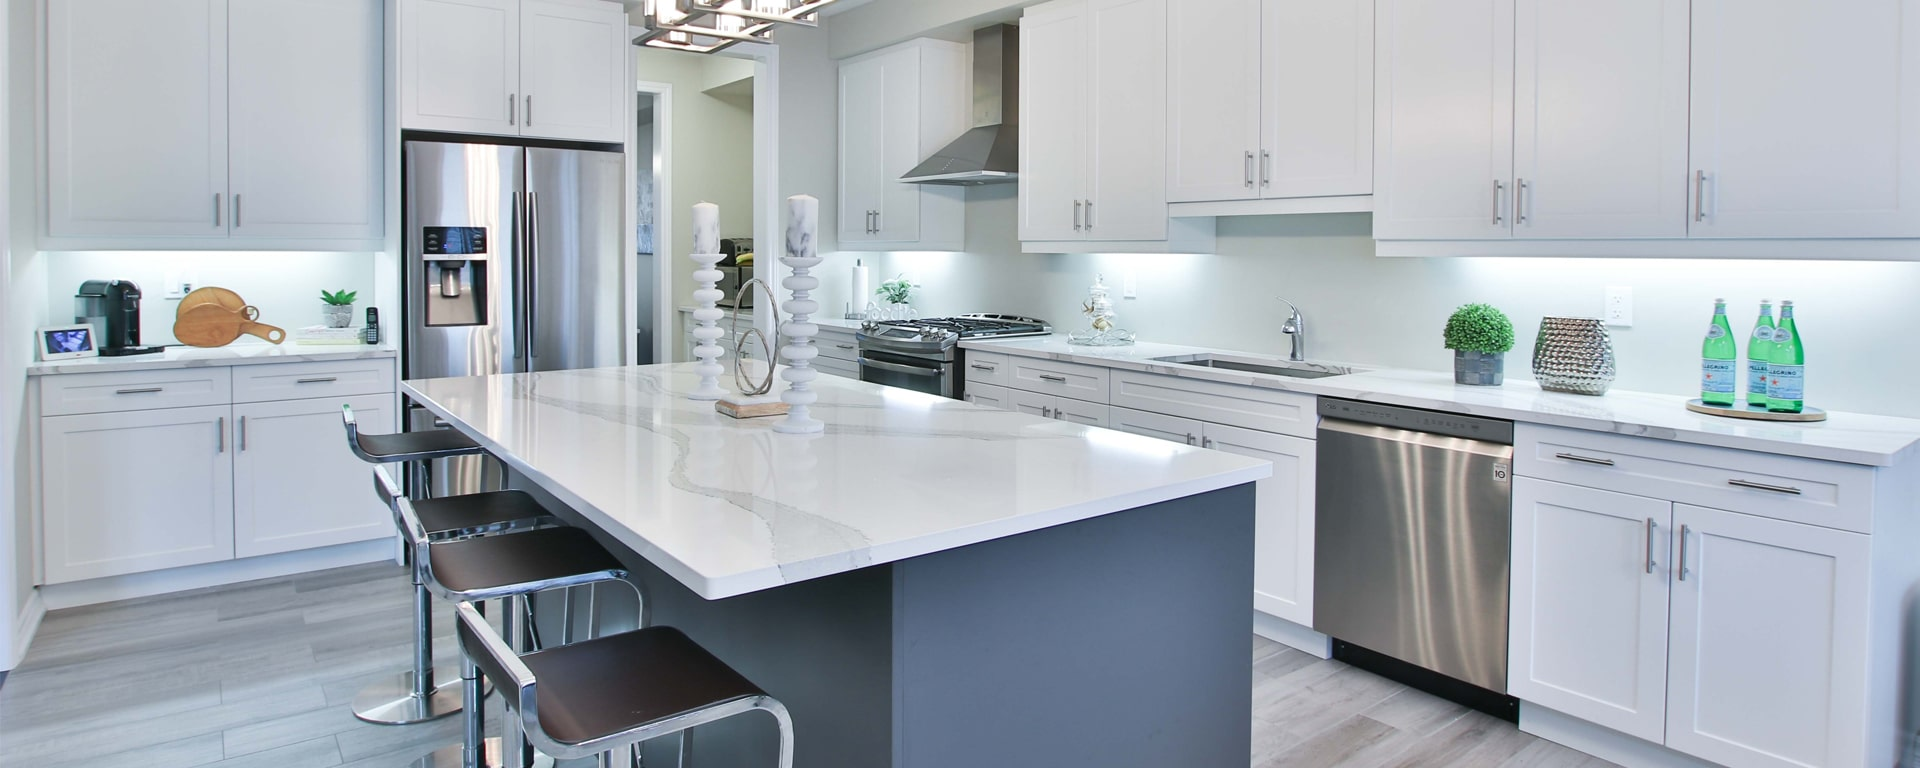 Stone Countertops in Kitchen